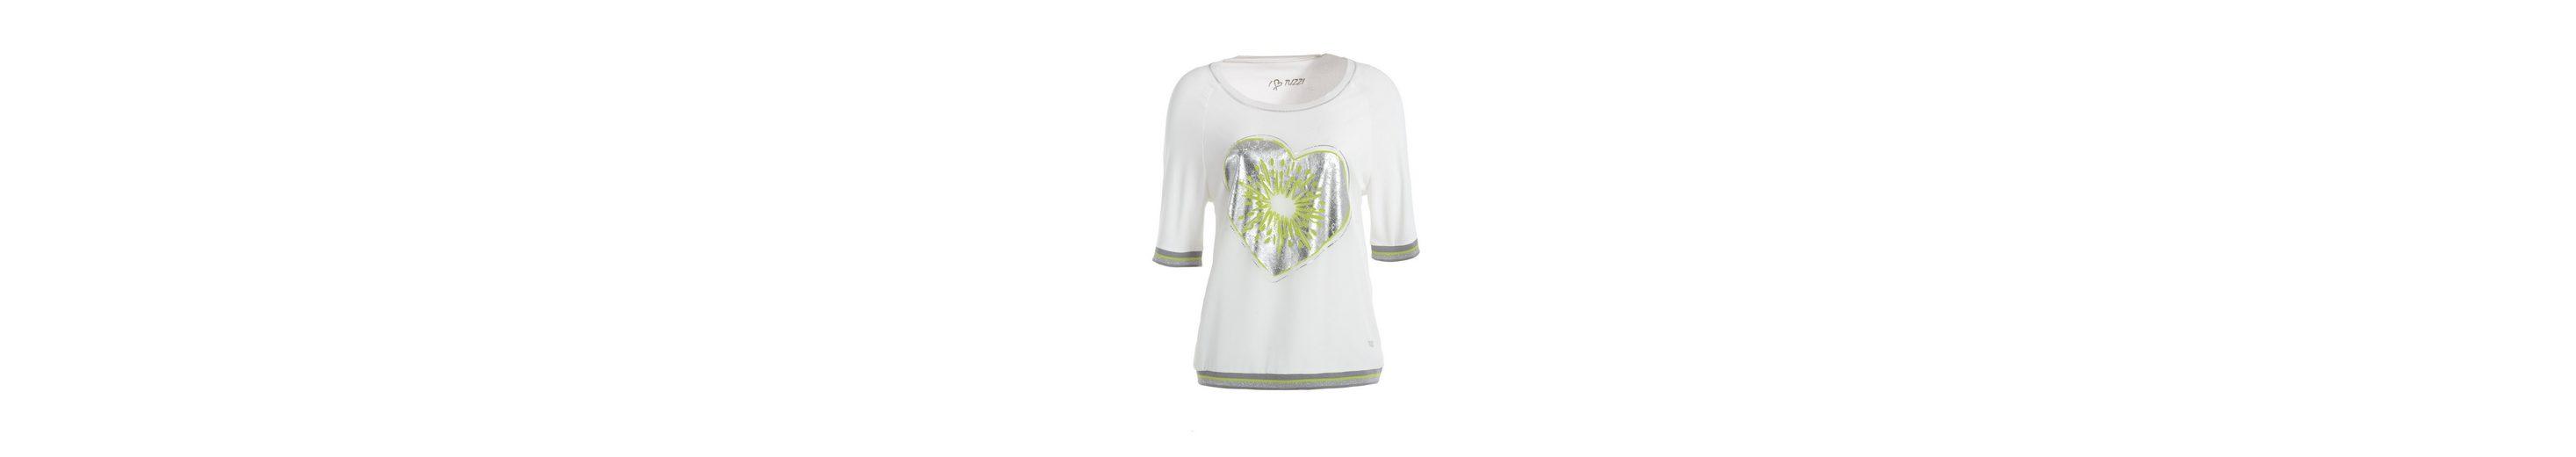 TUZZI Top-TShirt Blousonshirt mit 'Kiwi-Heart-Print' Freies Verschiffen Niedrig Versandkosten W6p1npv1